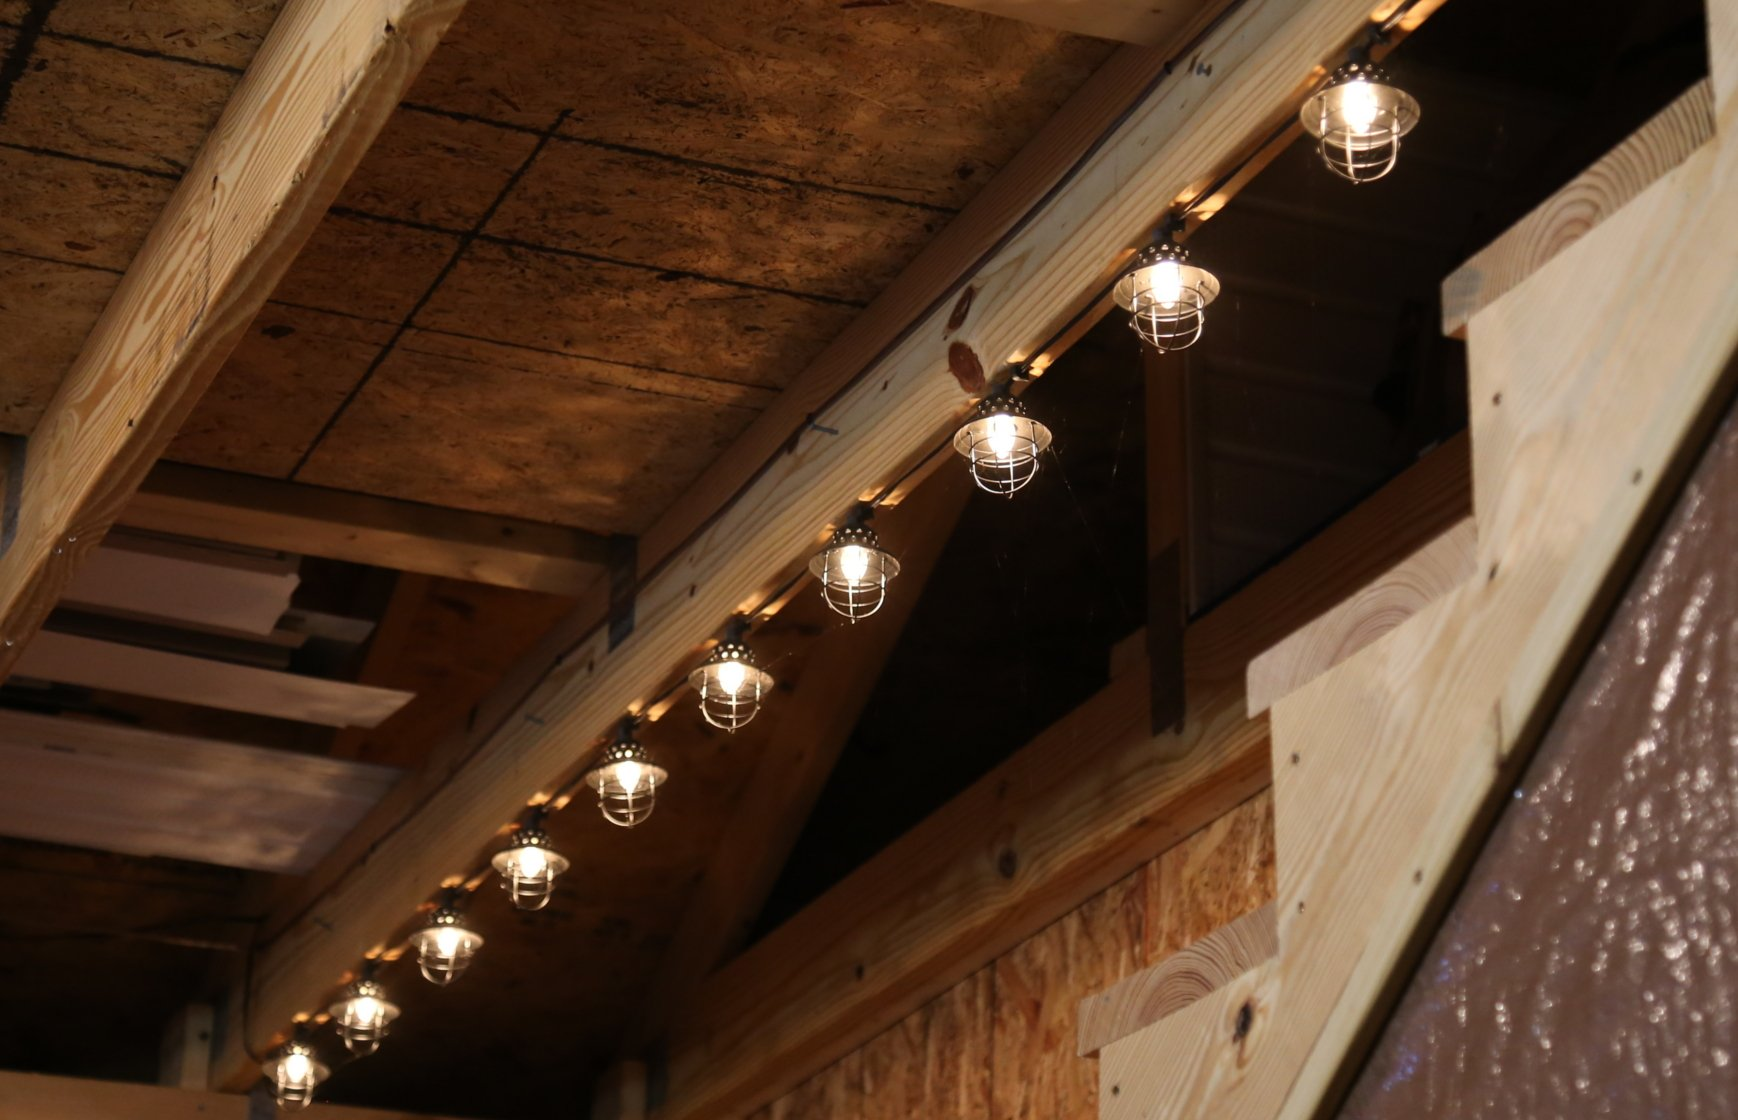 decor x led fixtures garage workshop intended for fans proportions ass and lights haiku big lighting